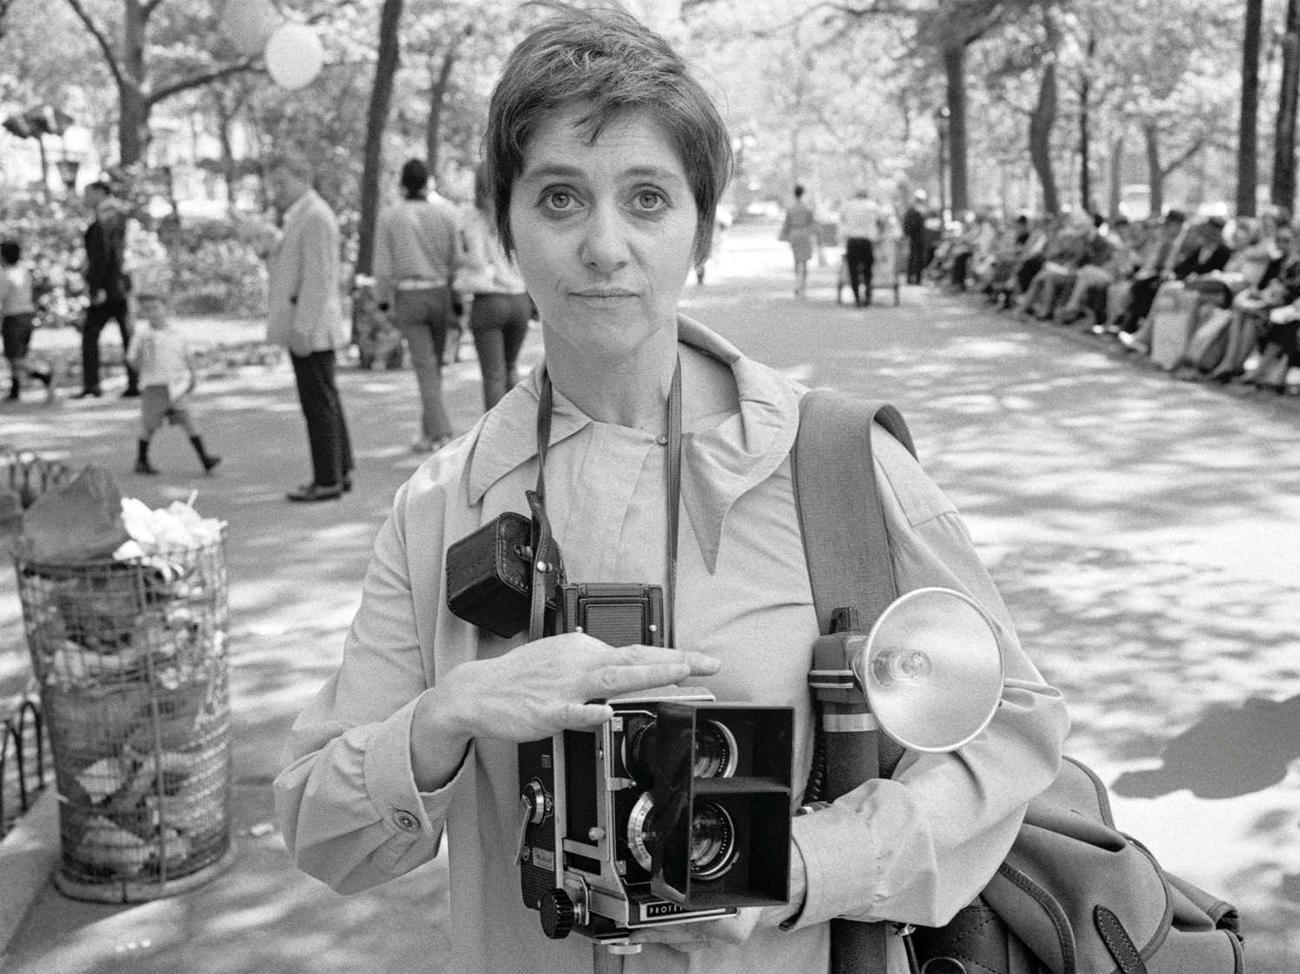 Time Microlit Author Julie Chevalier